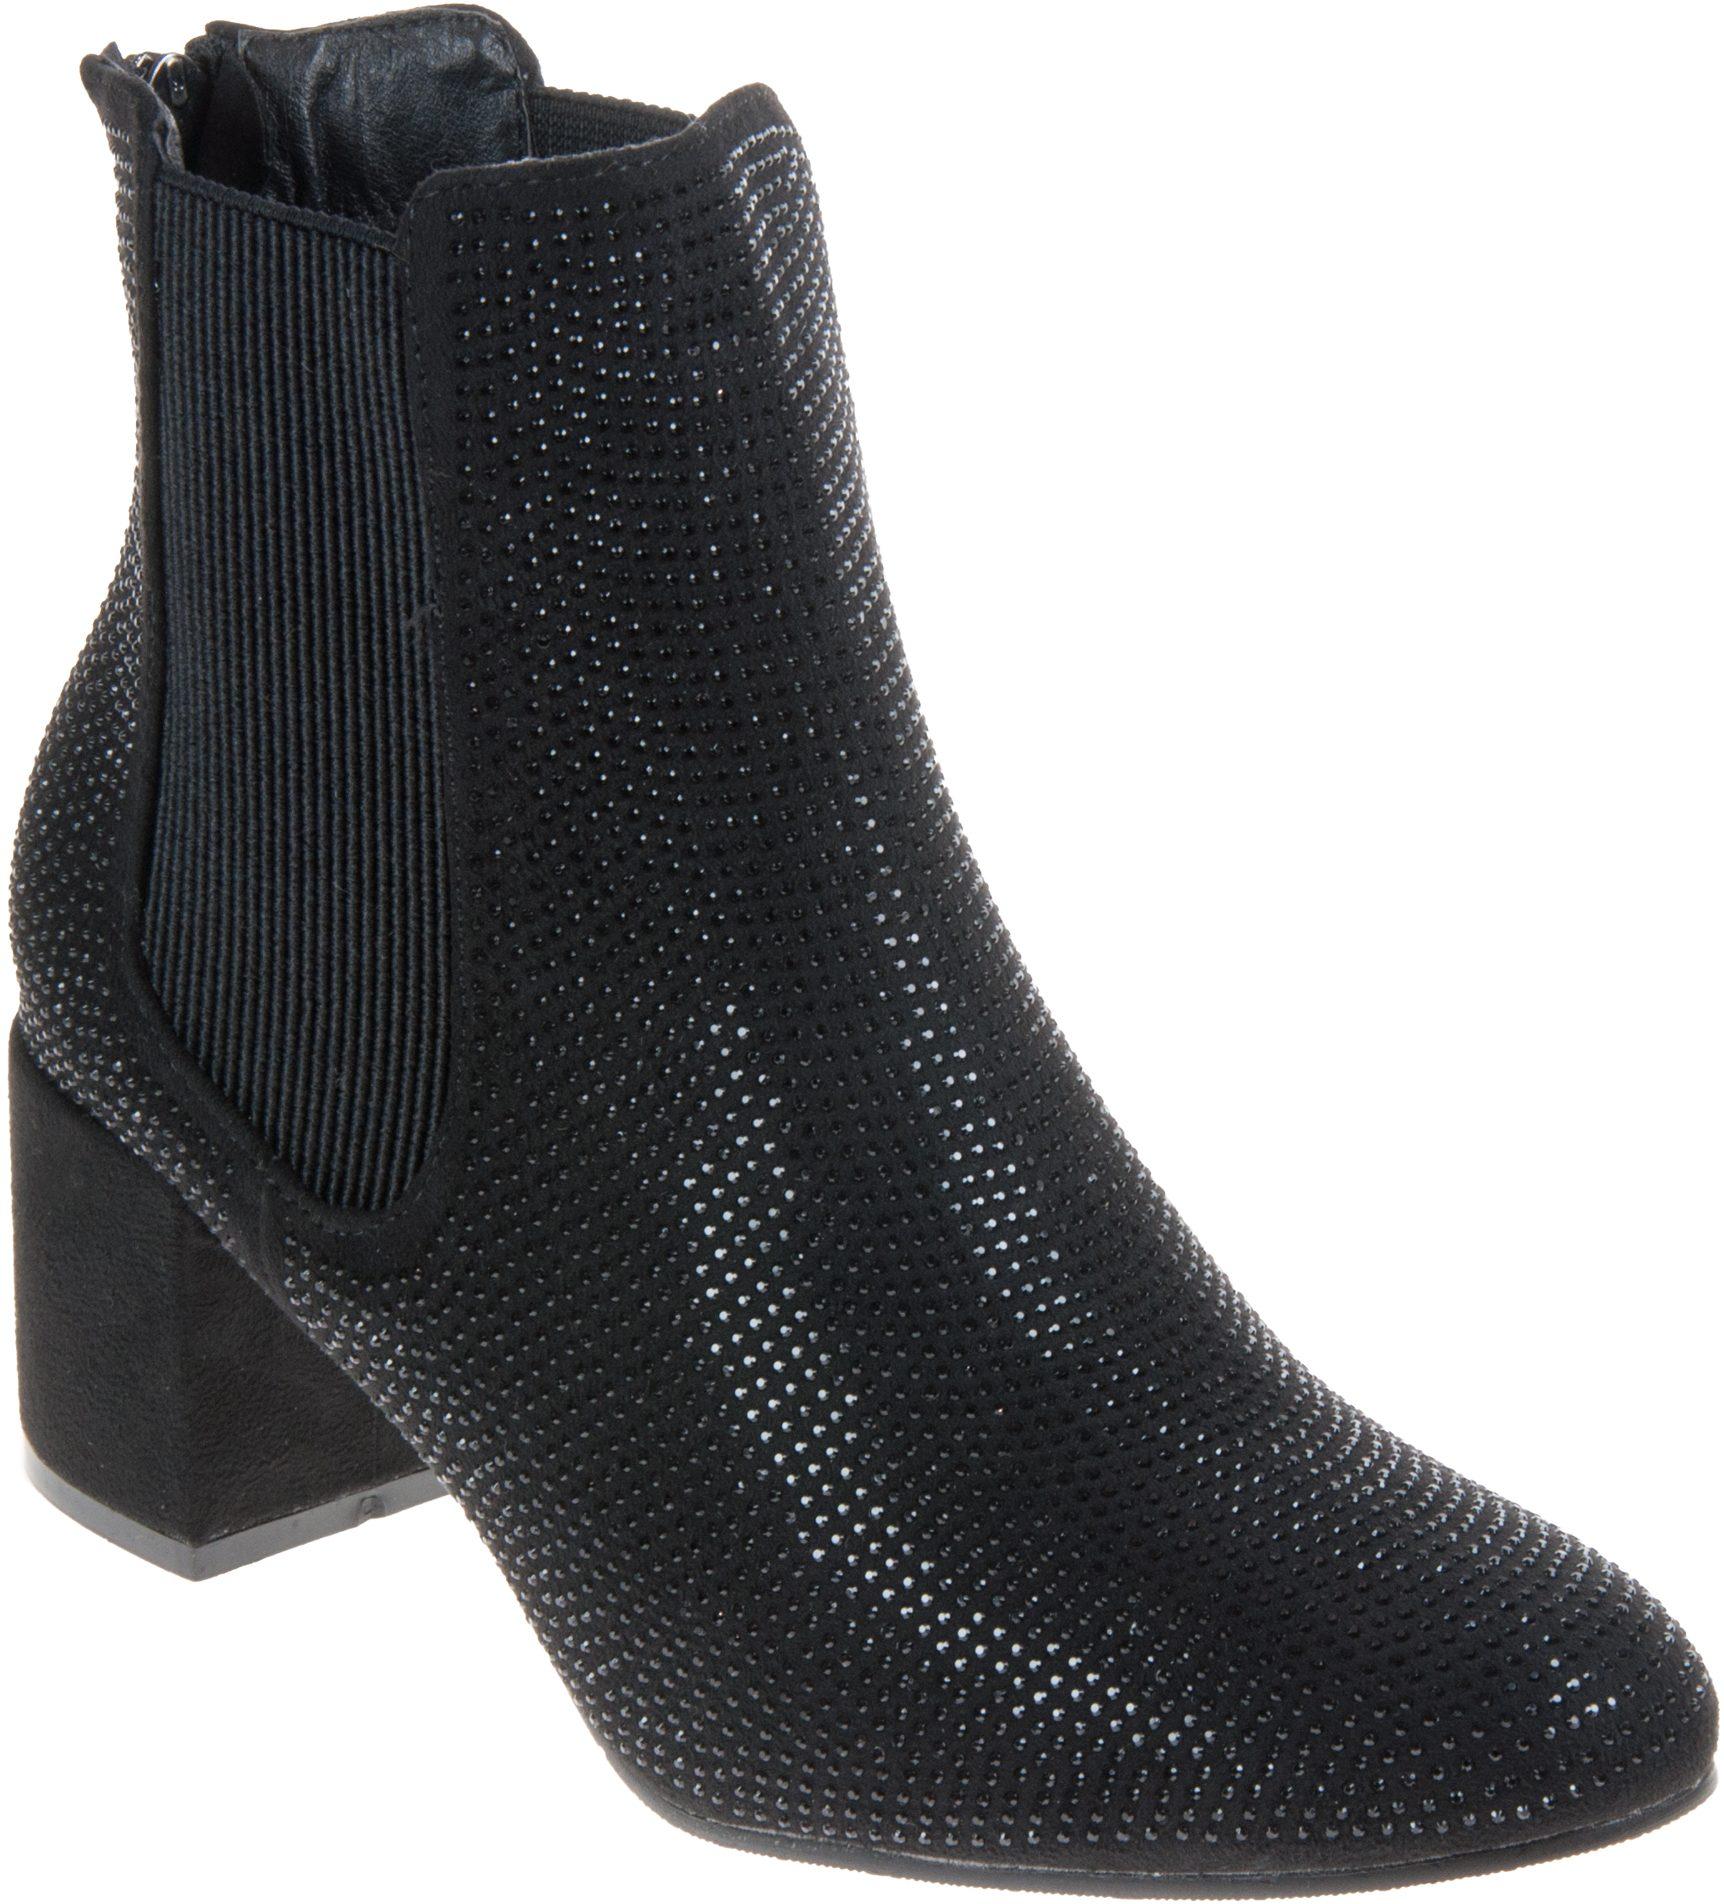 ed2e39f7 Heavenly Feet Wave Black Diamante - Ankle Boots - Humphries Shoes